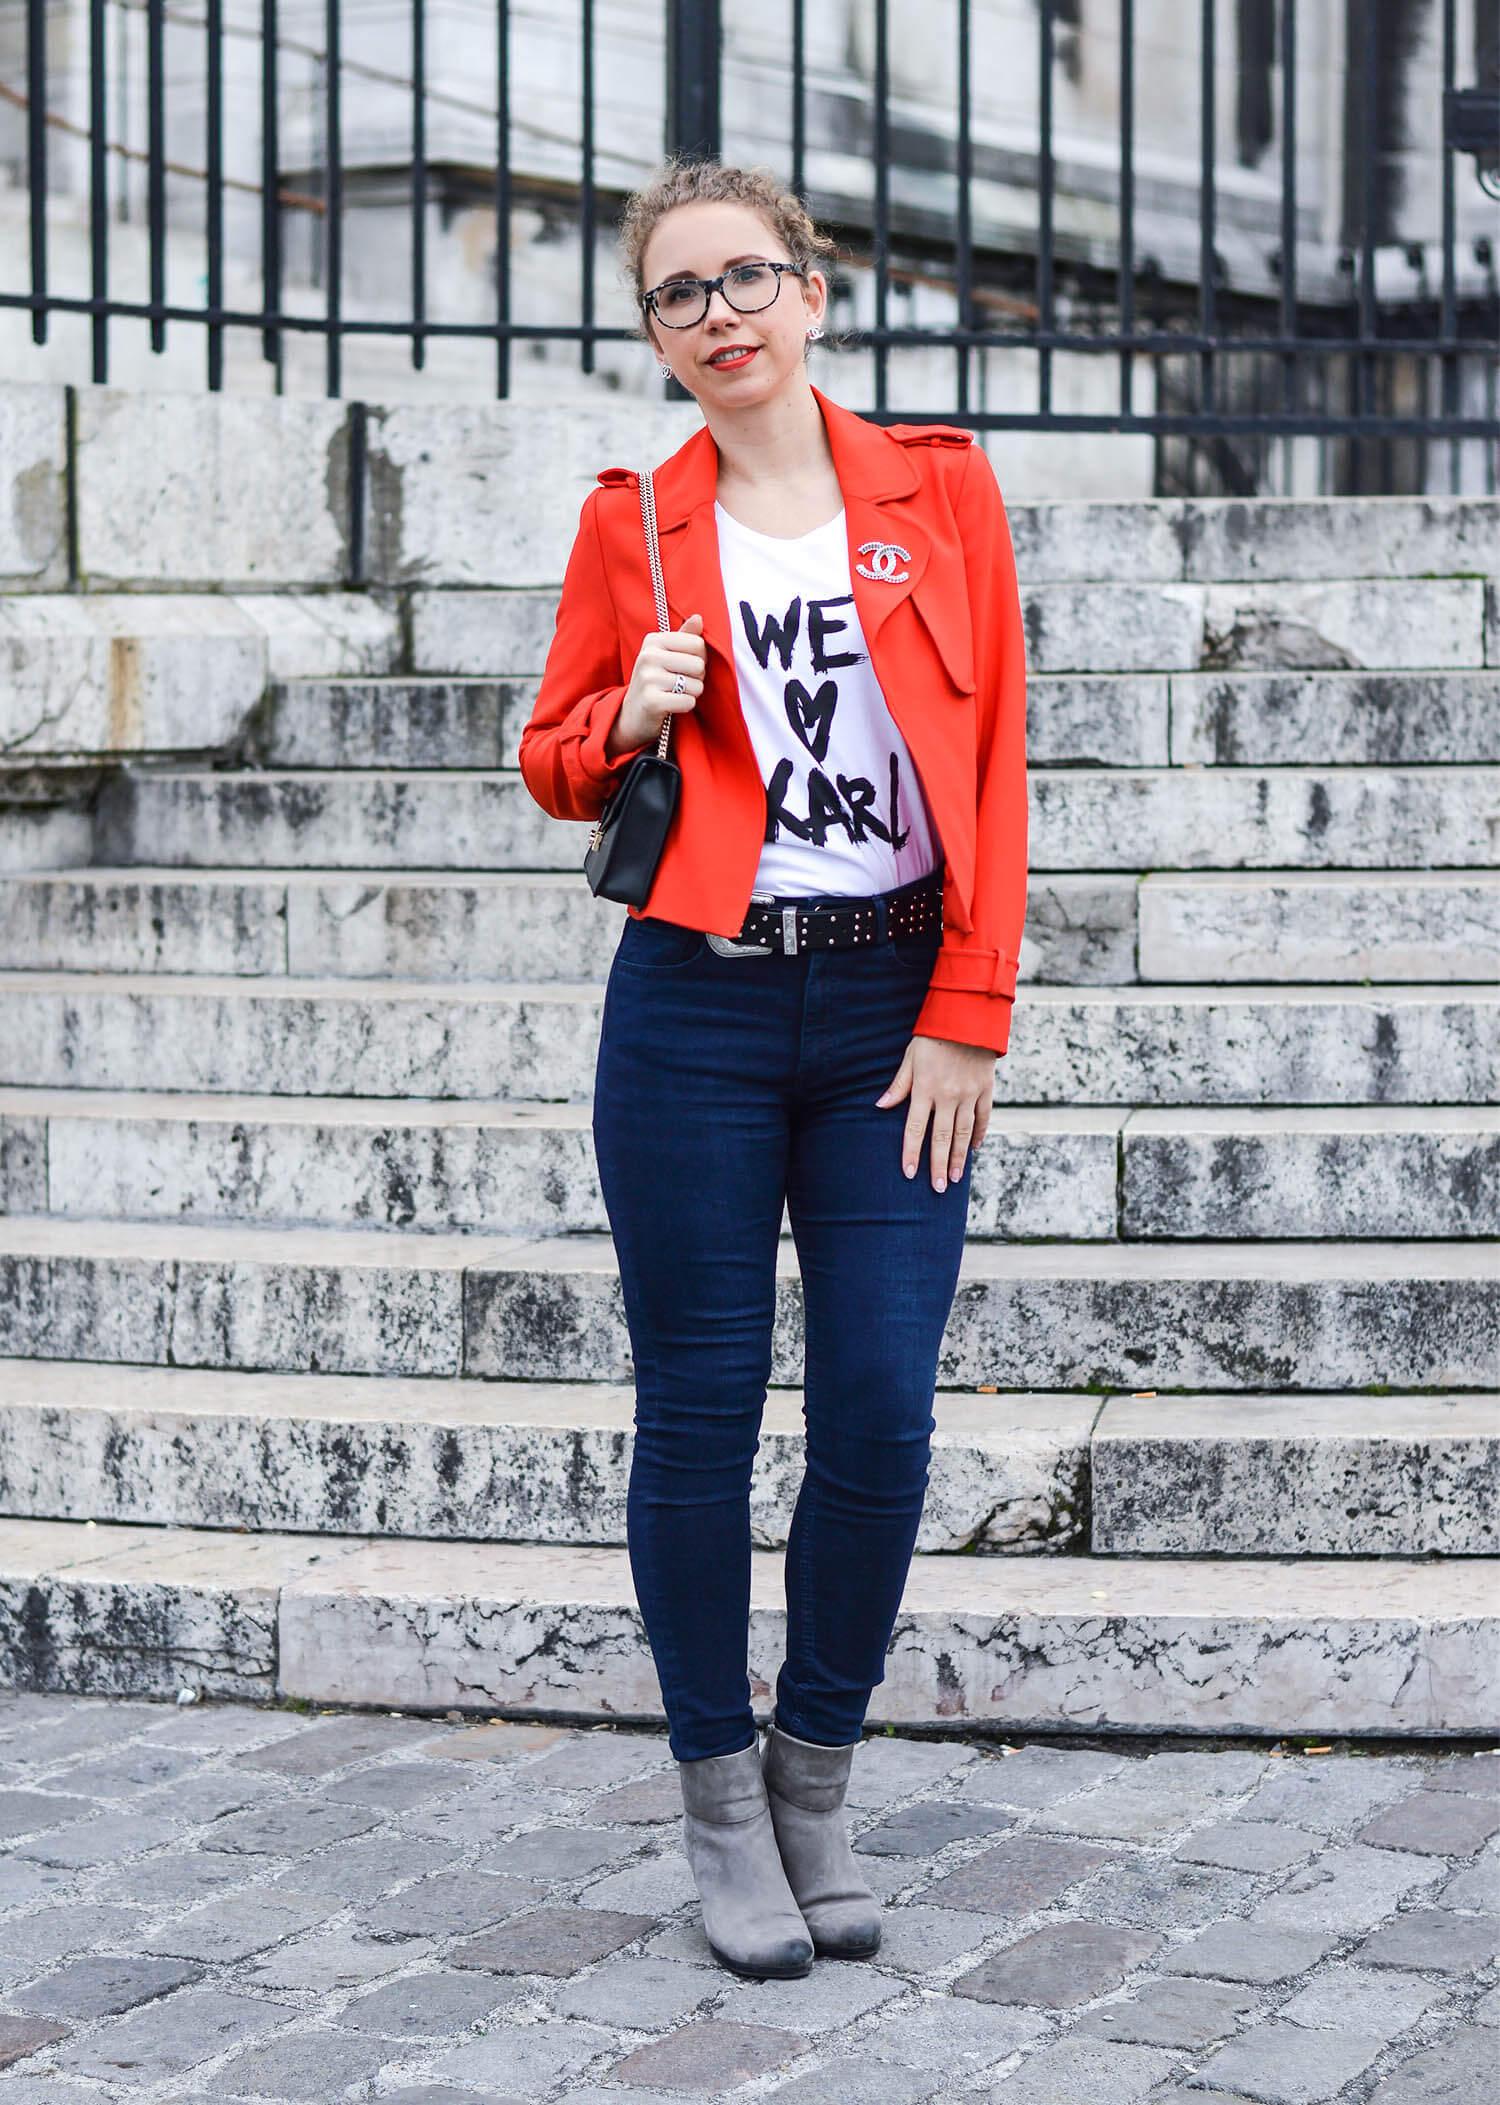 Kationette-fashionblog-nrw-Outfit-Karl-Lagerfeld-Sacré-Cœur-Paris-streetstyle-chanel-zara